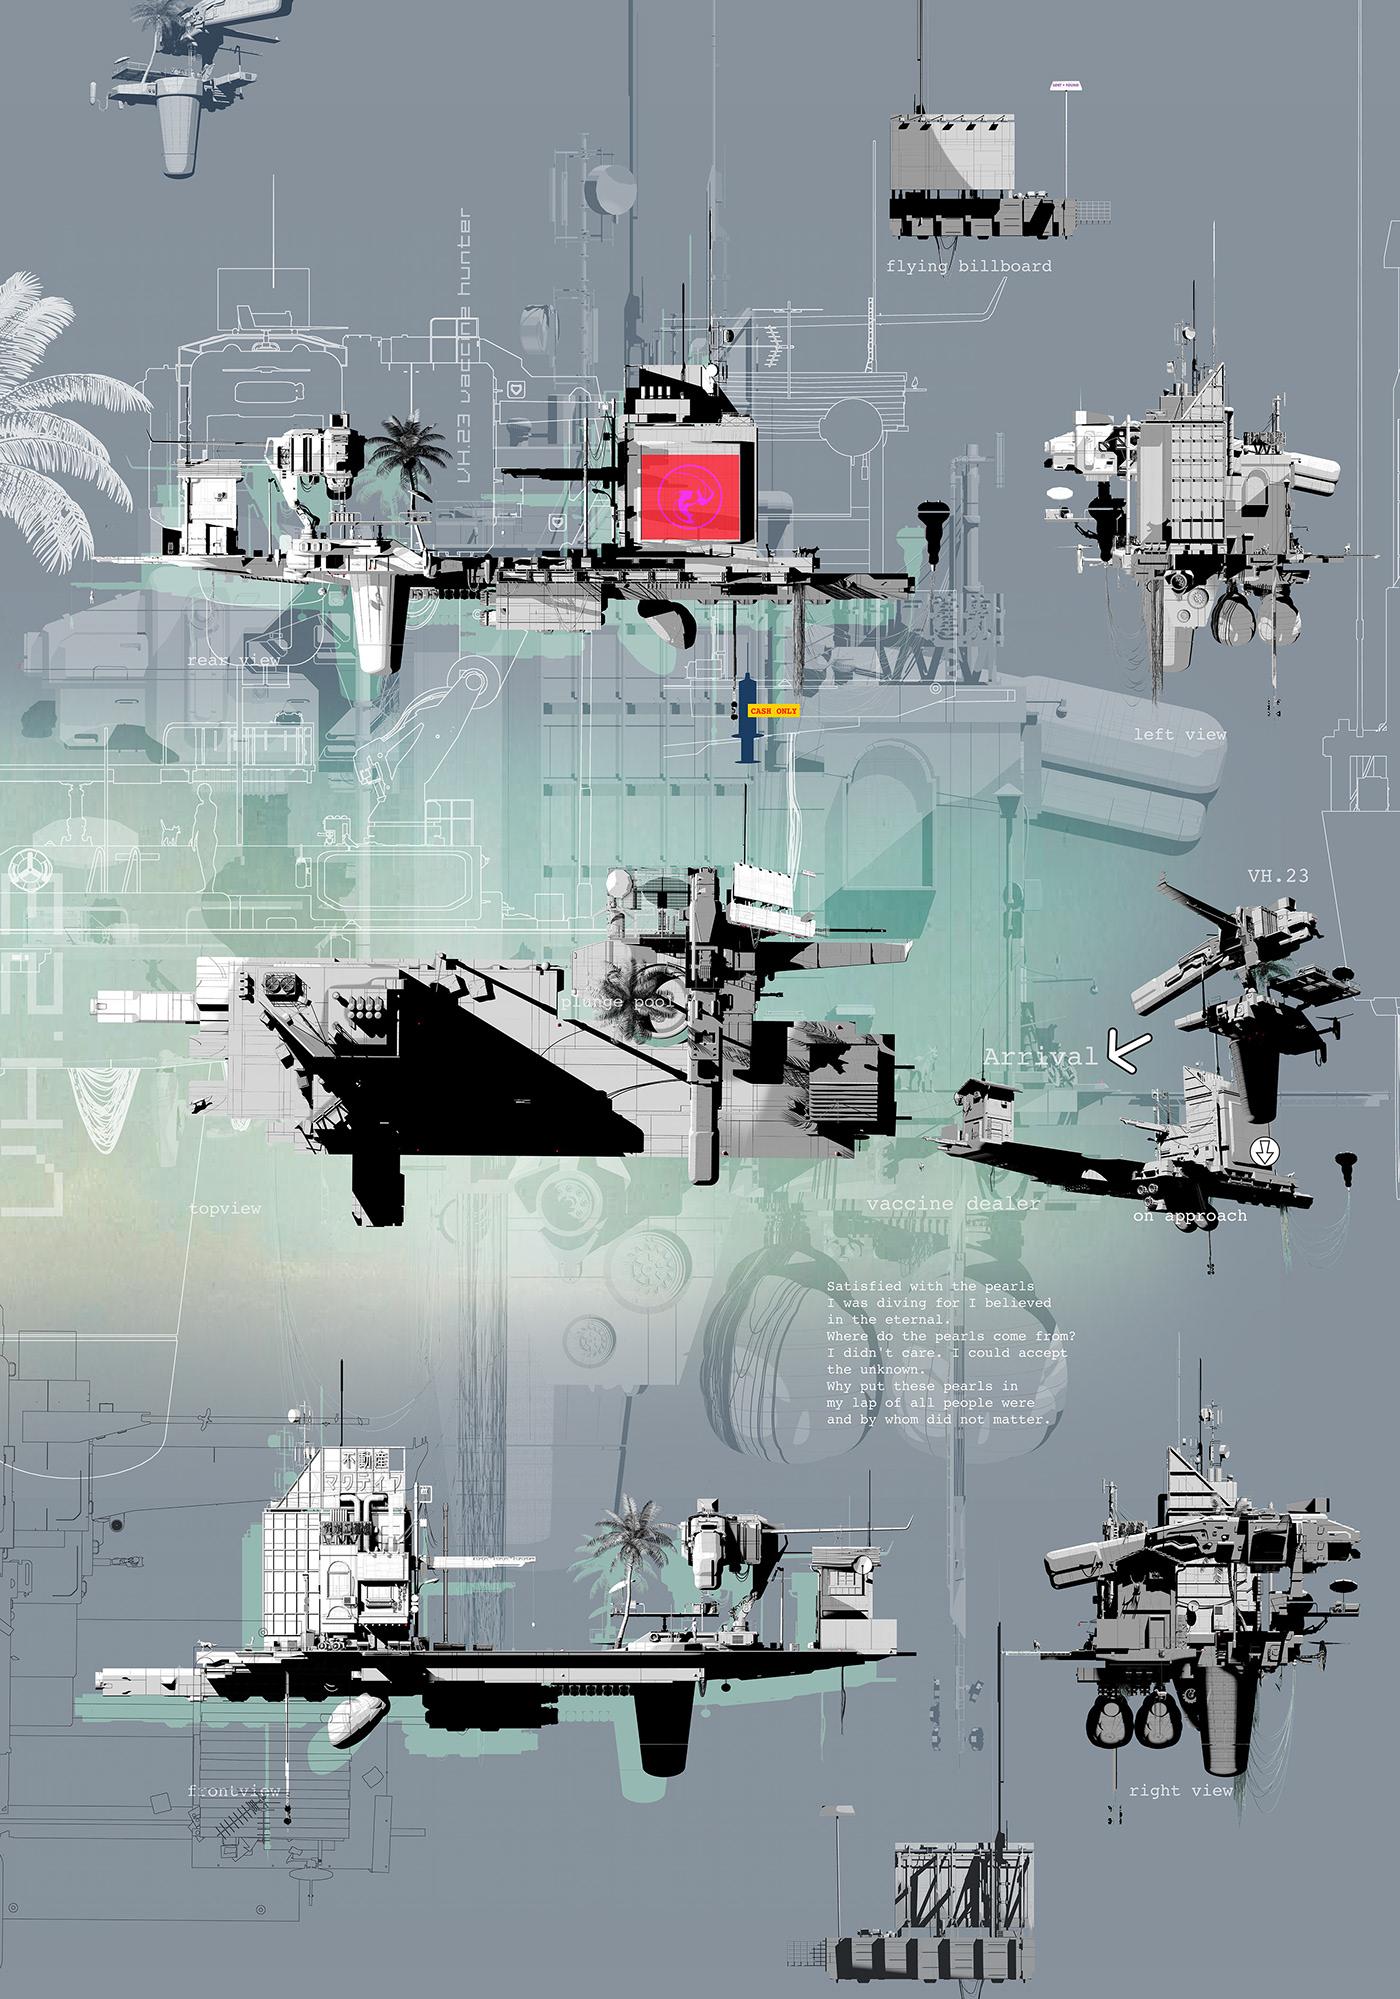 flying architecture Gundam Landscape machines narrative illustration Pearl diving robotics speculative design speculative fiction vaccine